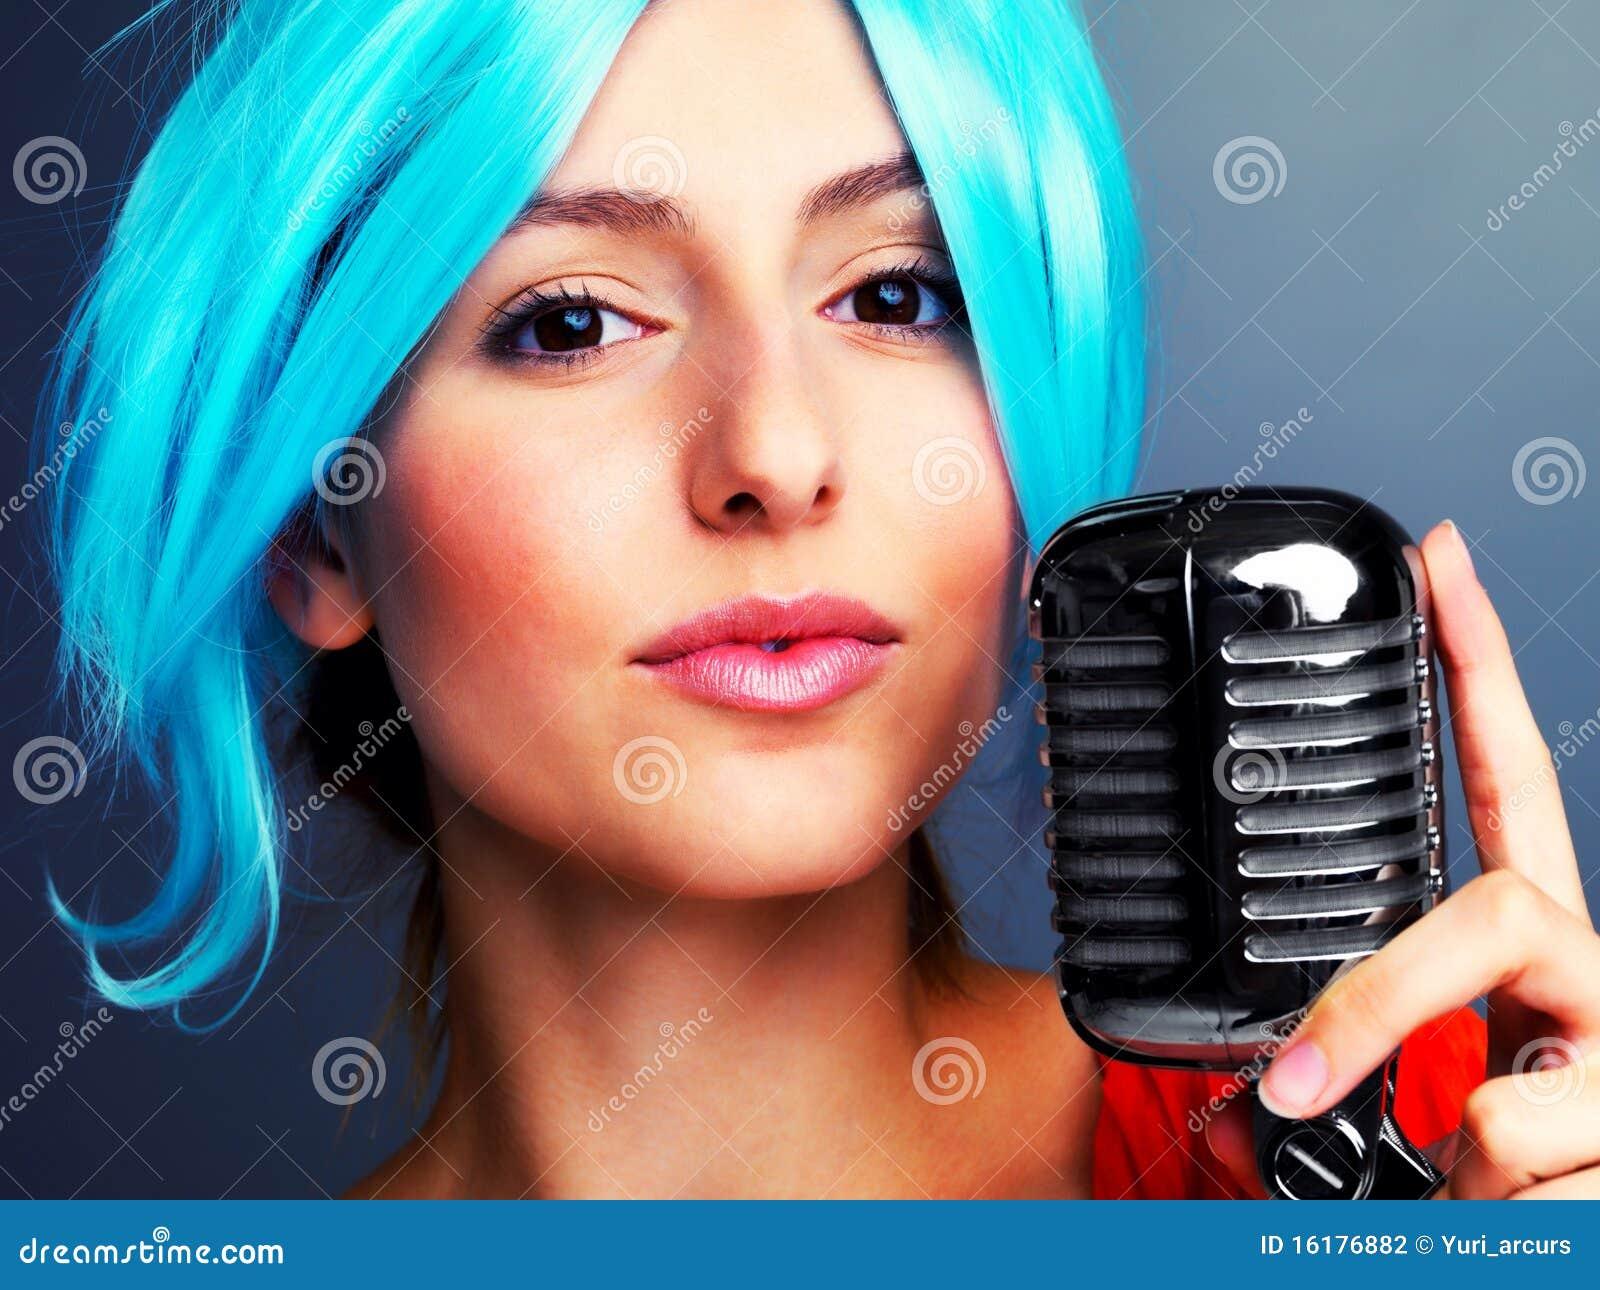 Female Jazz Singer Holding An Retro Microphone Stock Photo ...